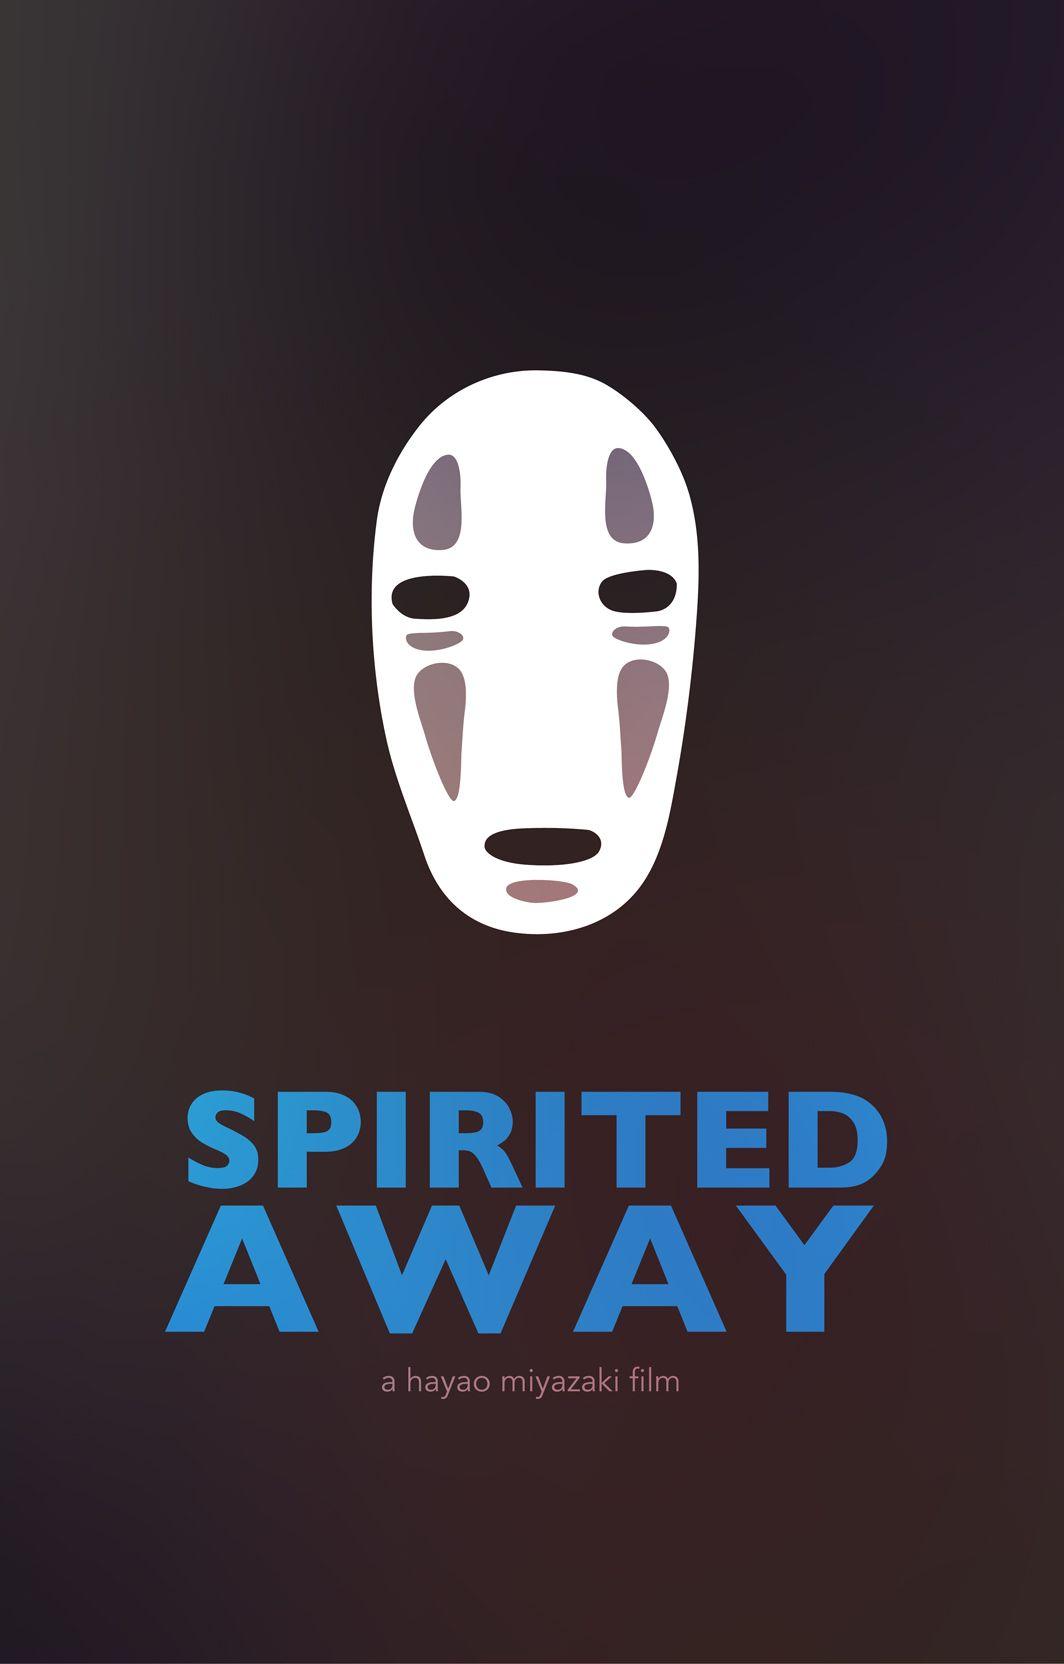 Spirited Away Minimalist Movie Poster | Graphic ...